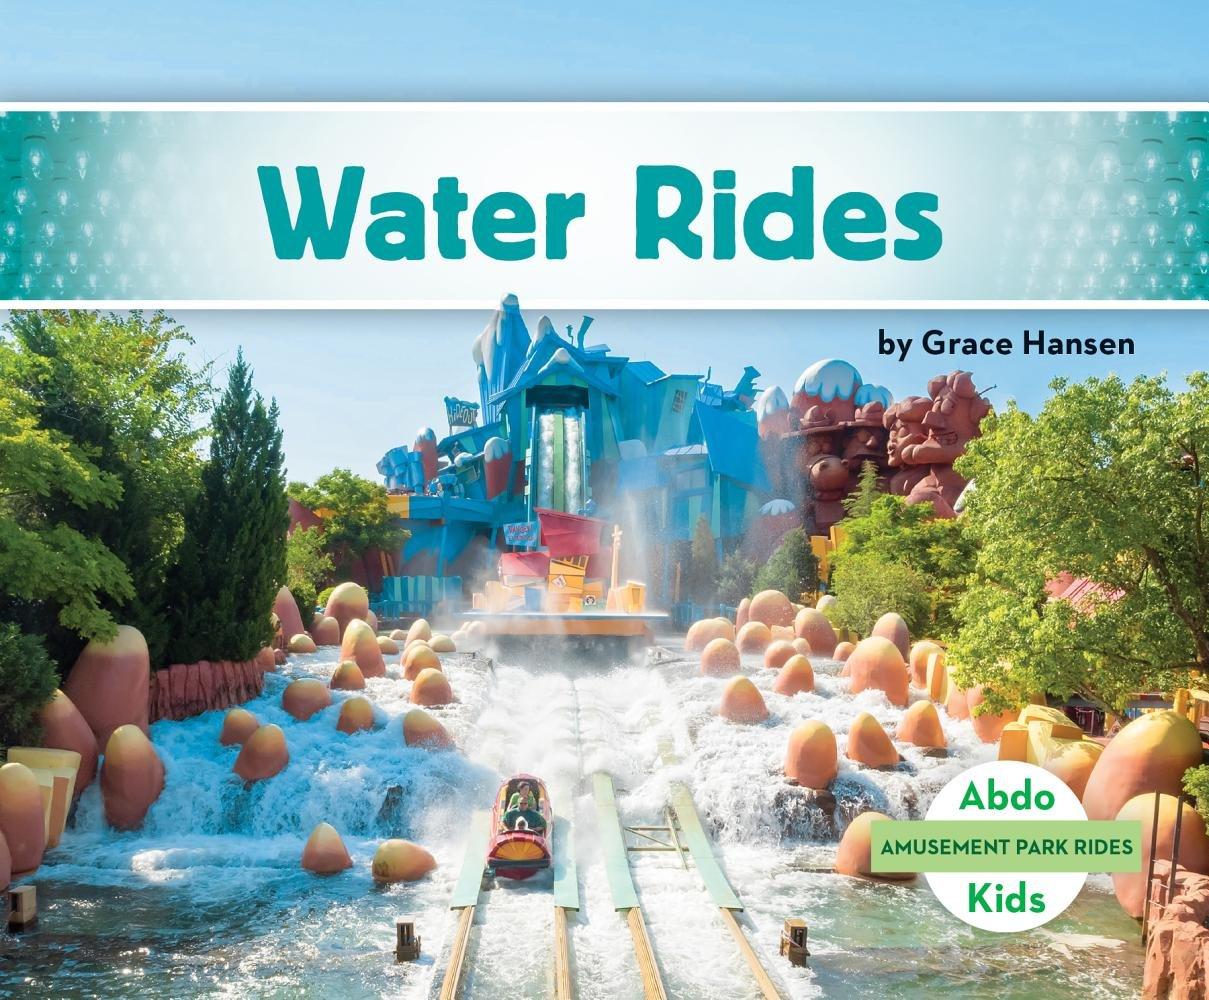 Water Rides (Amusement Park Rides)